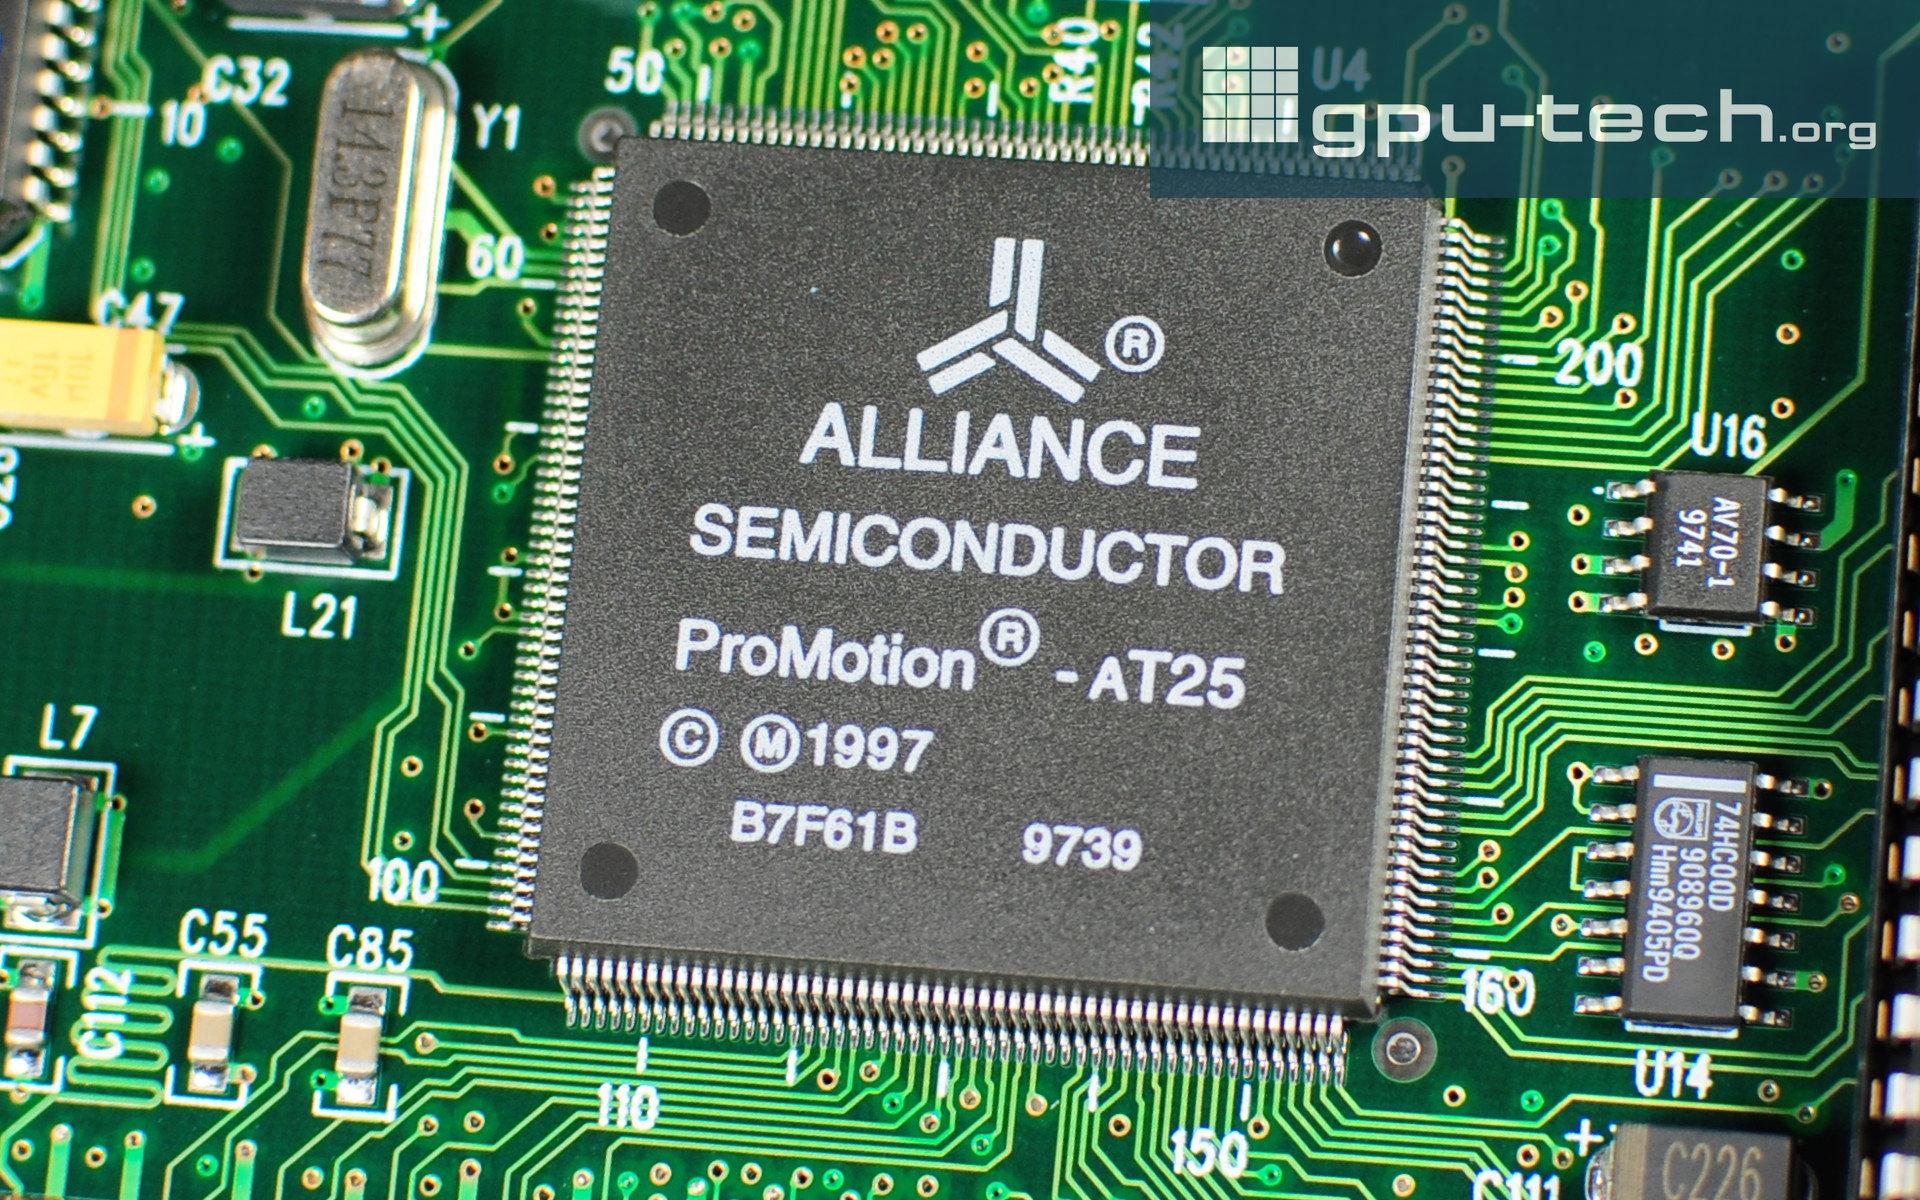 3dfx Voodoo Rush: Alliance ProMotion AT25 (2D)